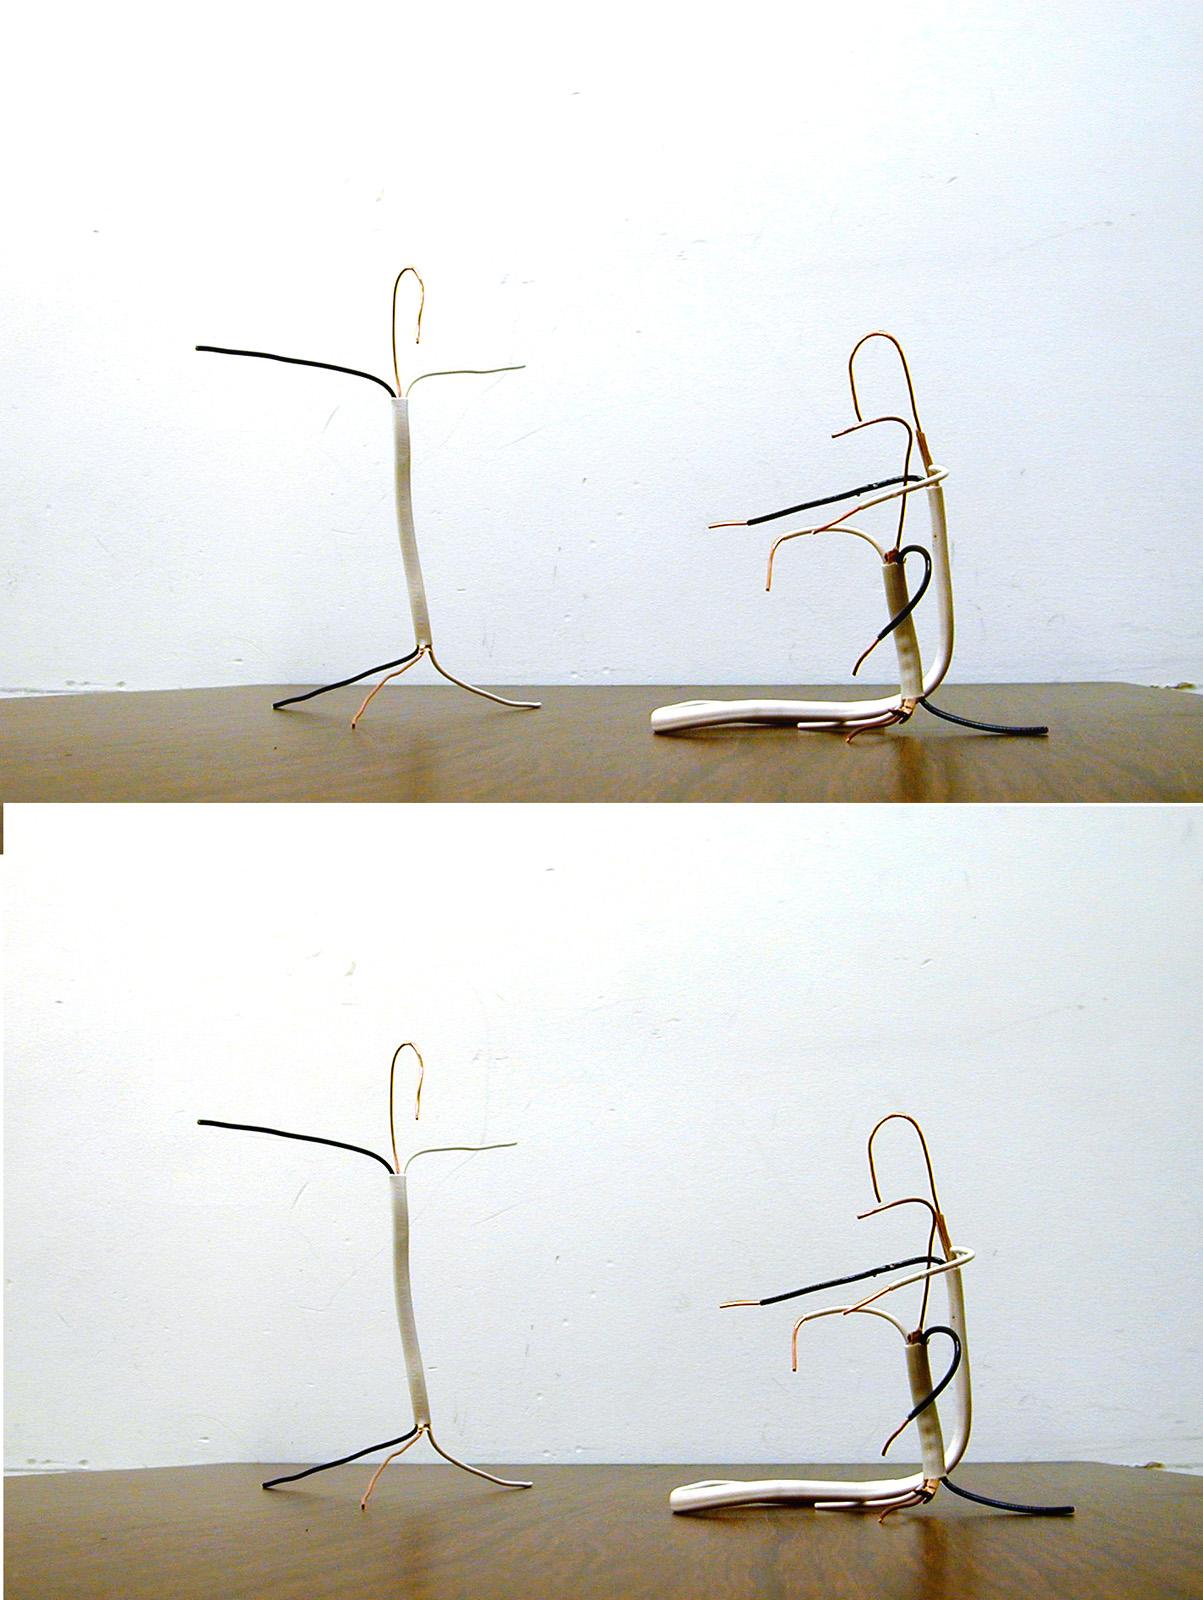 B. Copper Wire and Pipe   Jens Zorn Sculpture